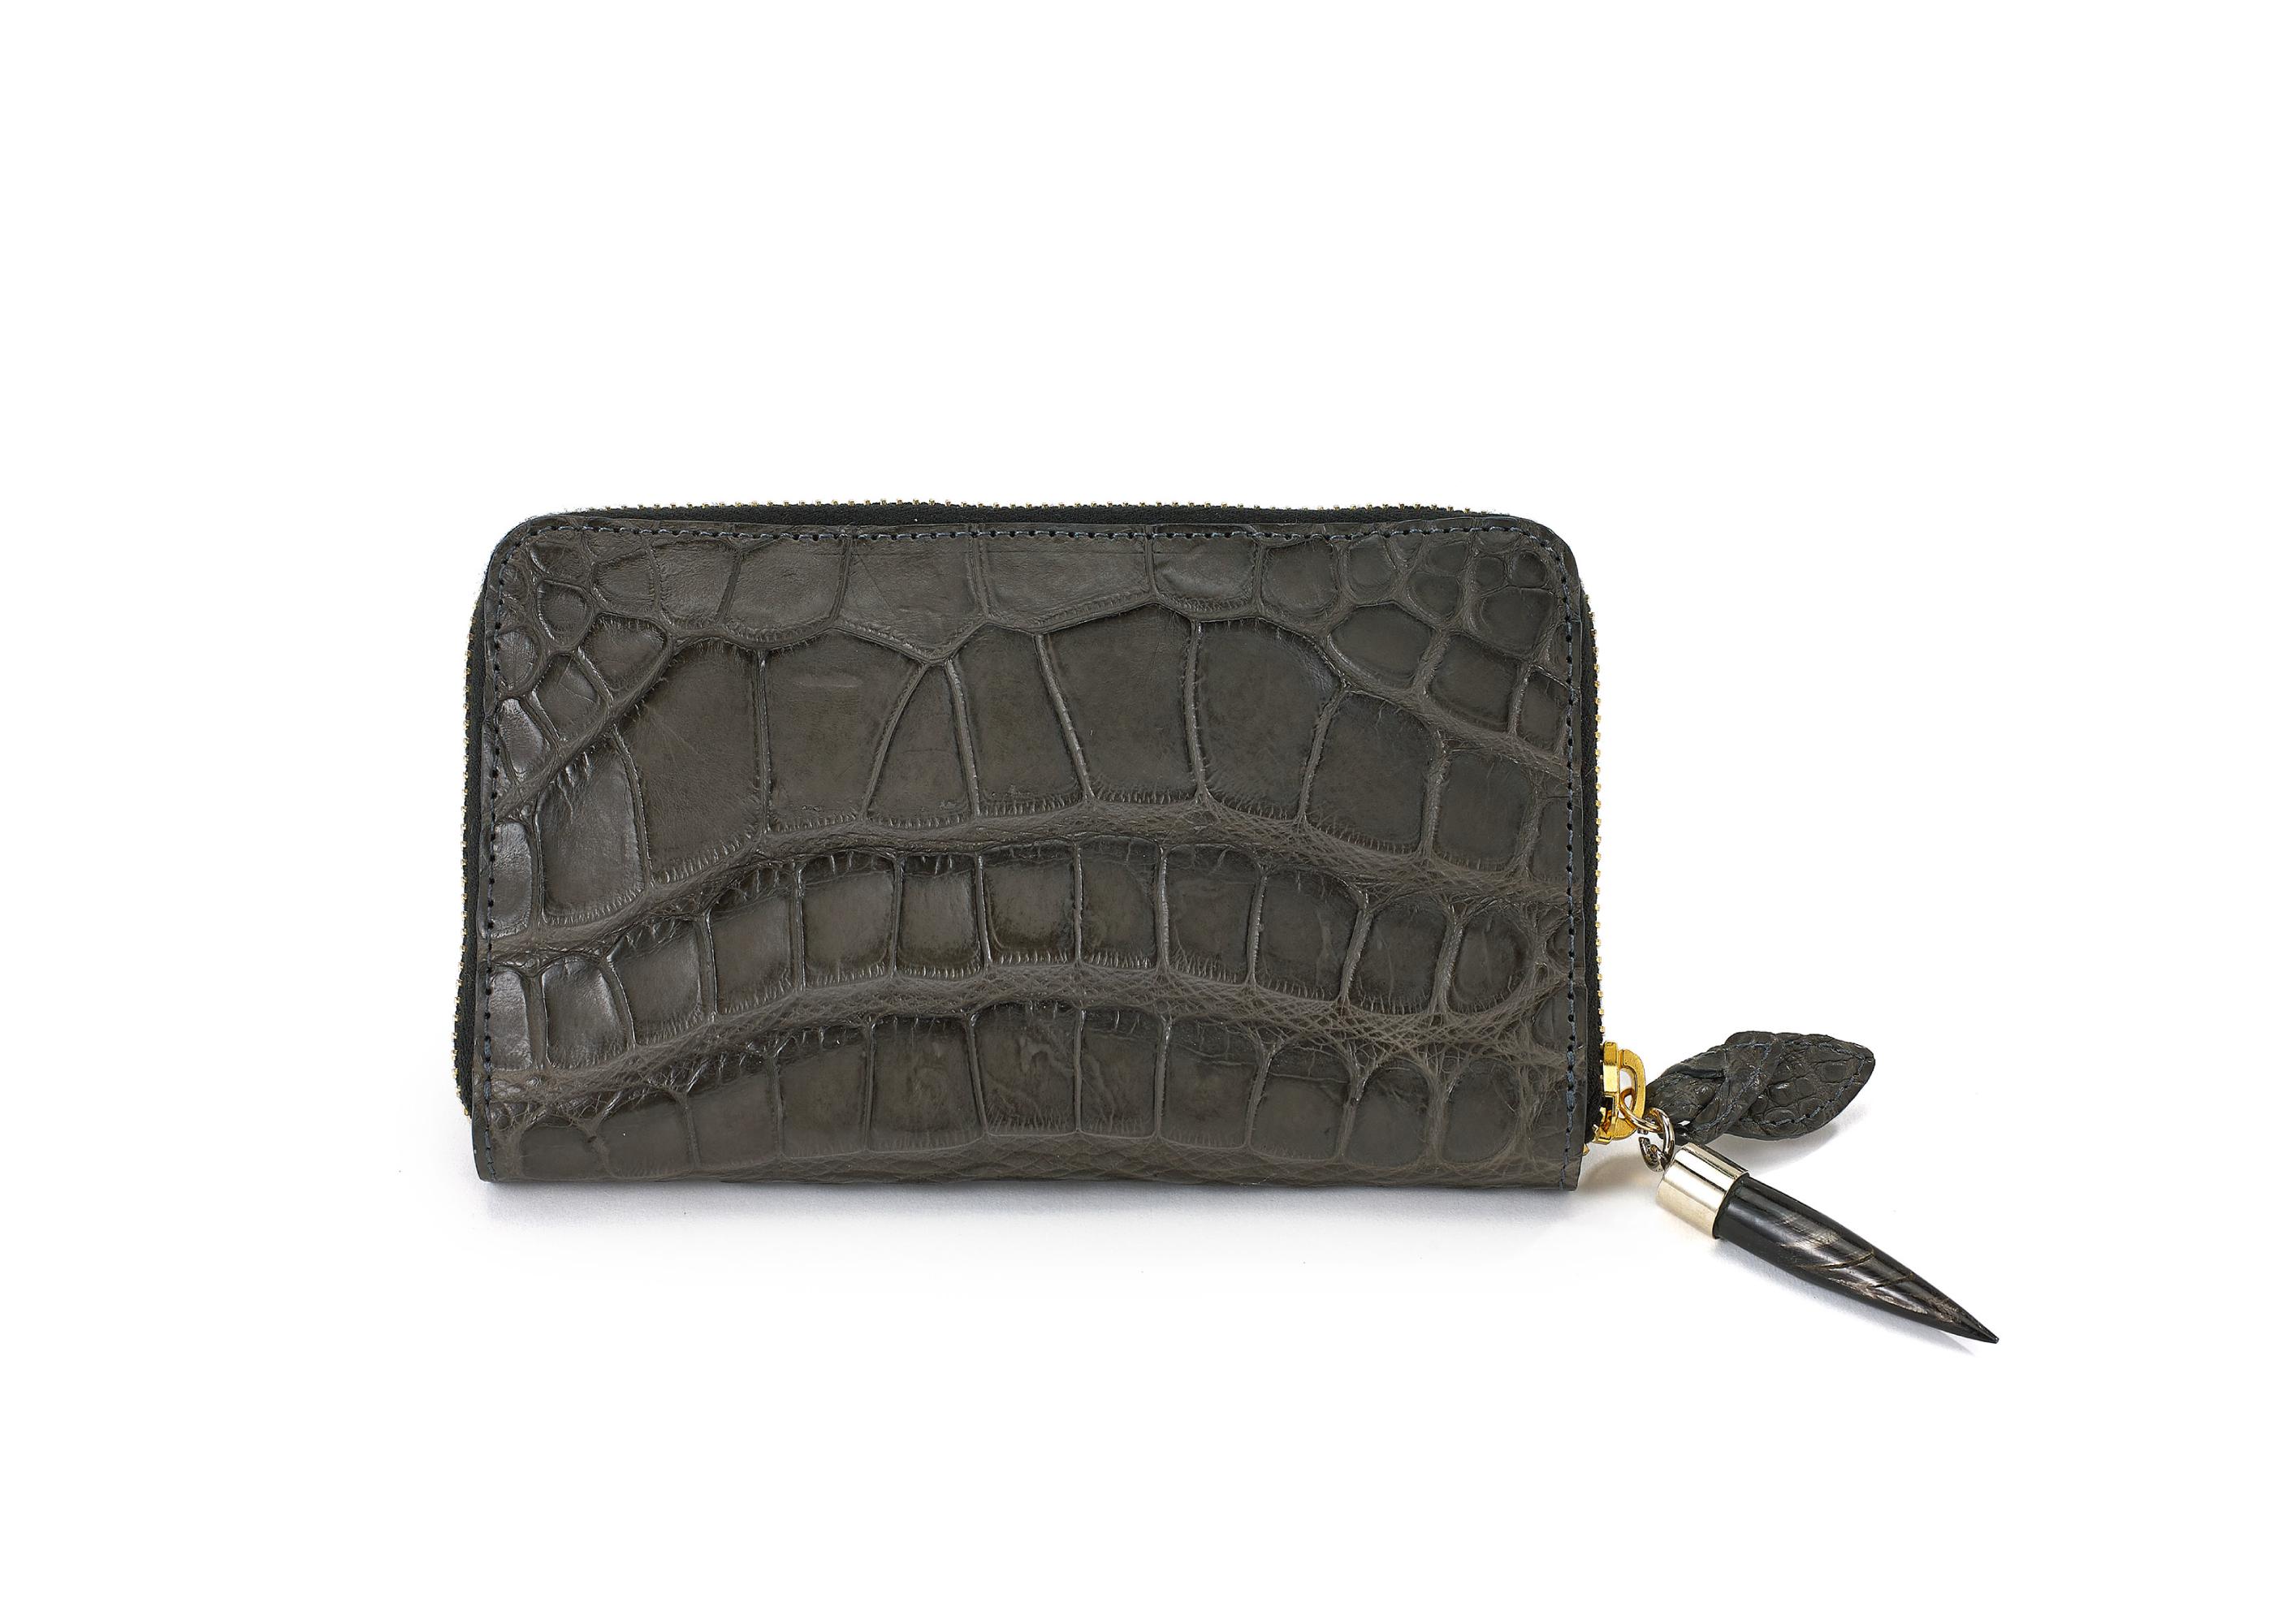 wallet-new Wallet-Alligator-